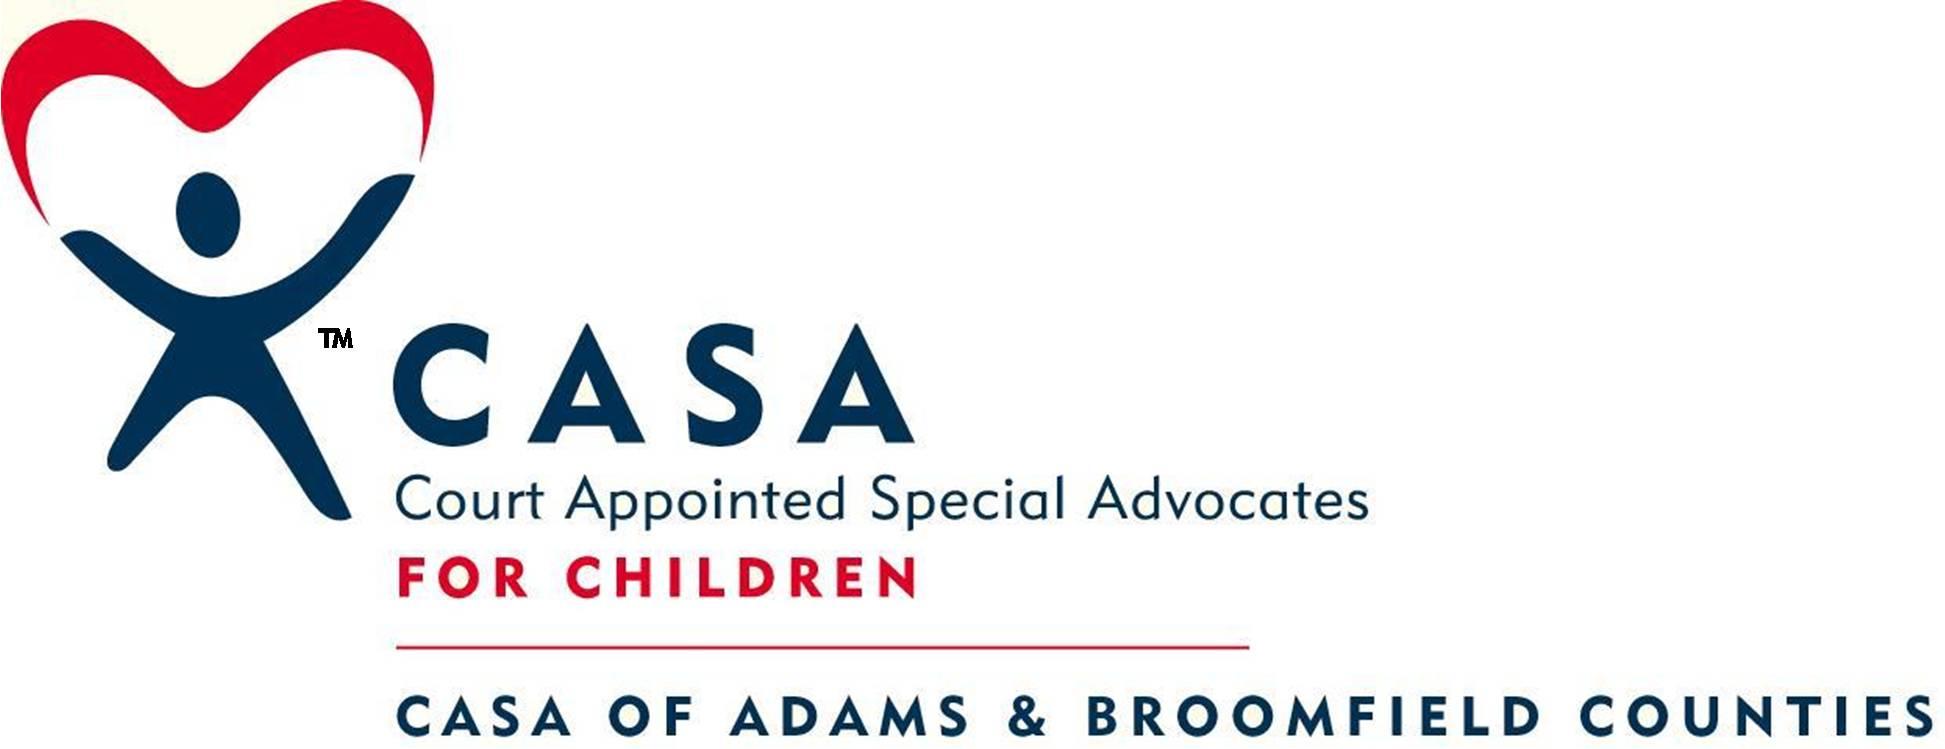 CASA logo_TM.jpg